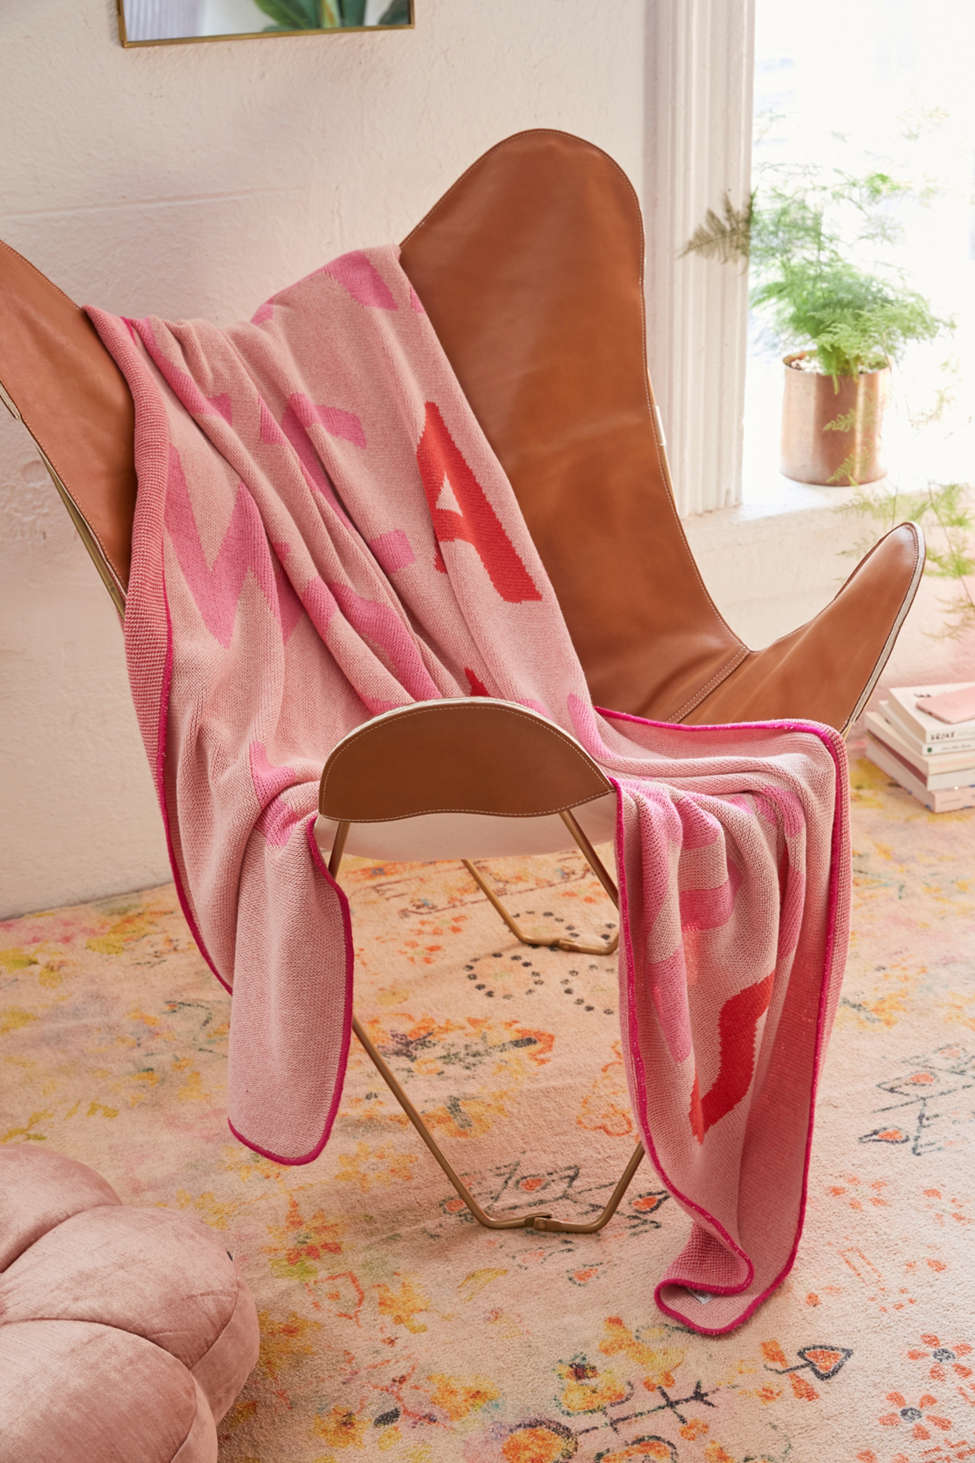 Slide View: 2: Calhoun & Co. Mamas Knit Throw Blanket